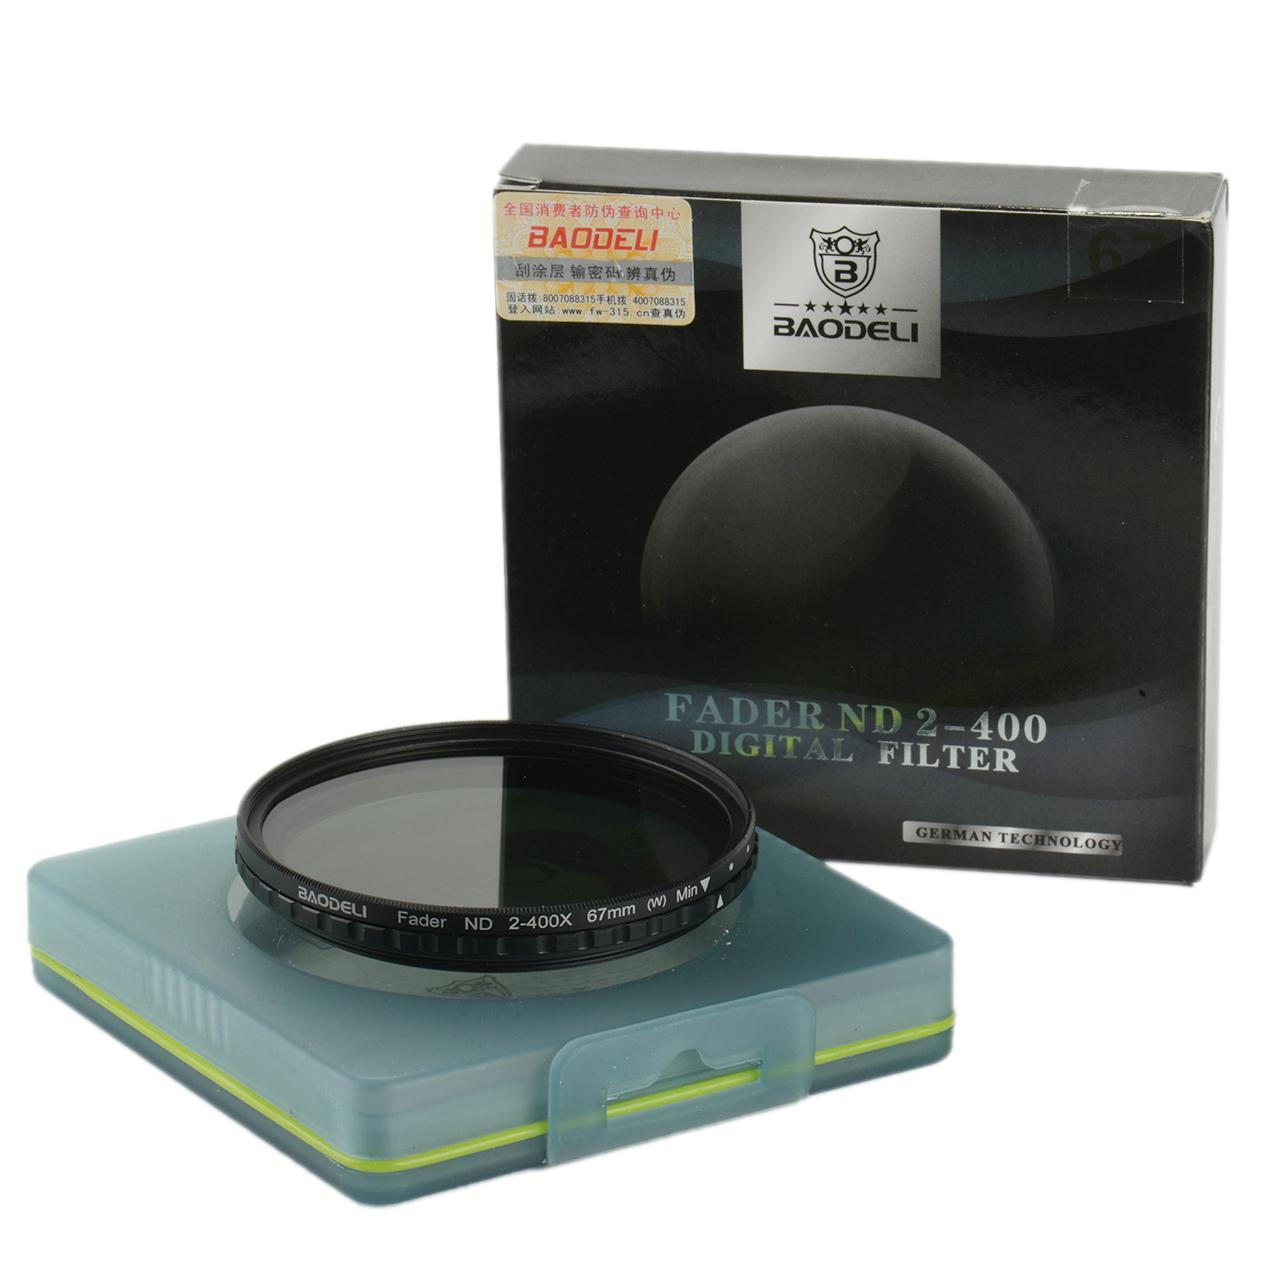 فیلتر لنز بائودلی مدل 67 FADER ND2-400